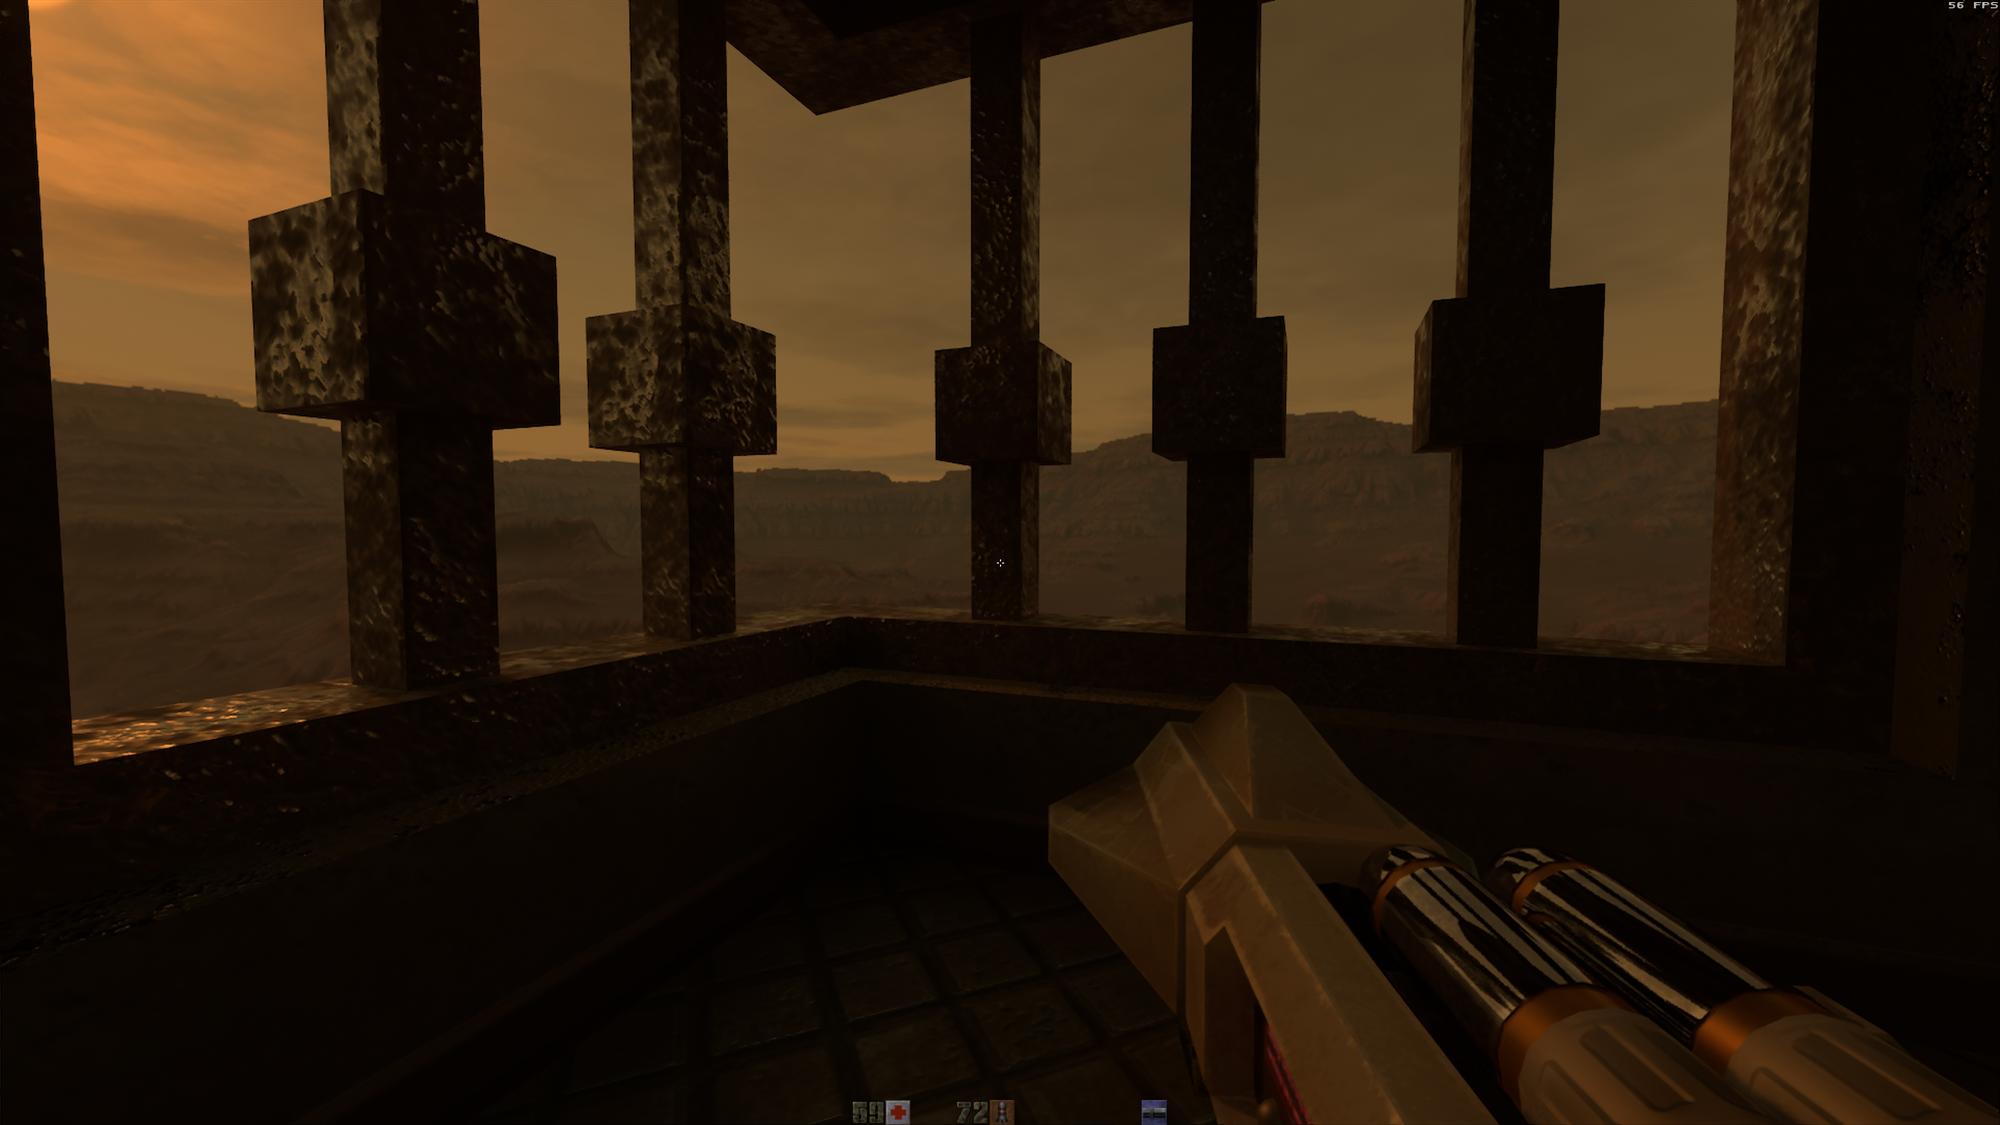 Quake 2 RTX Remaster Screenshot 2019.11.29 - 19.47.51.00.png